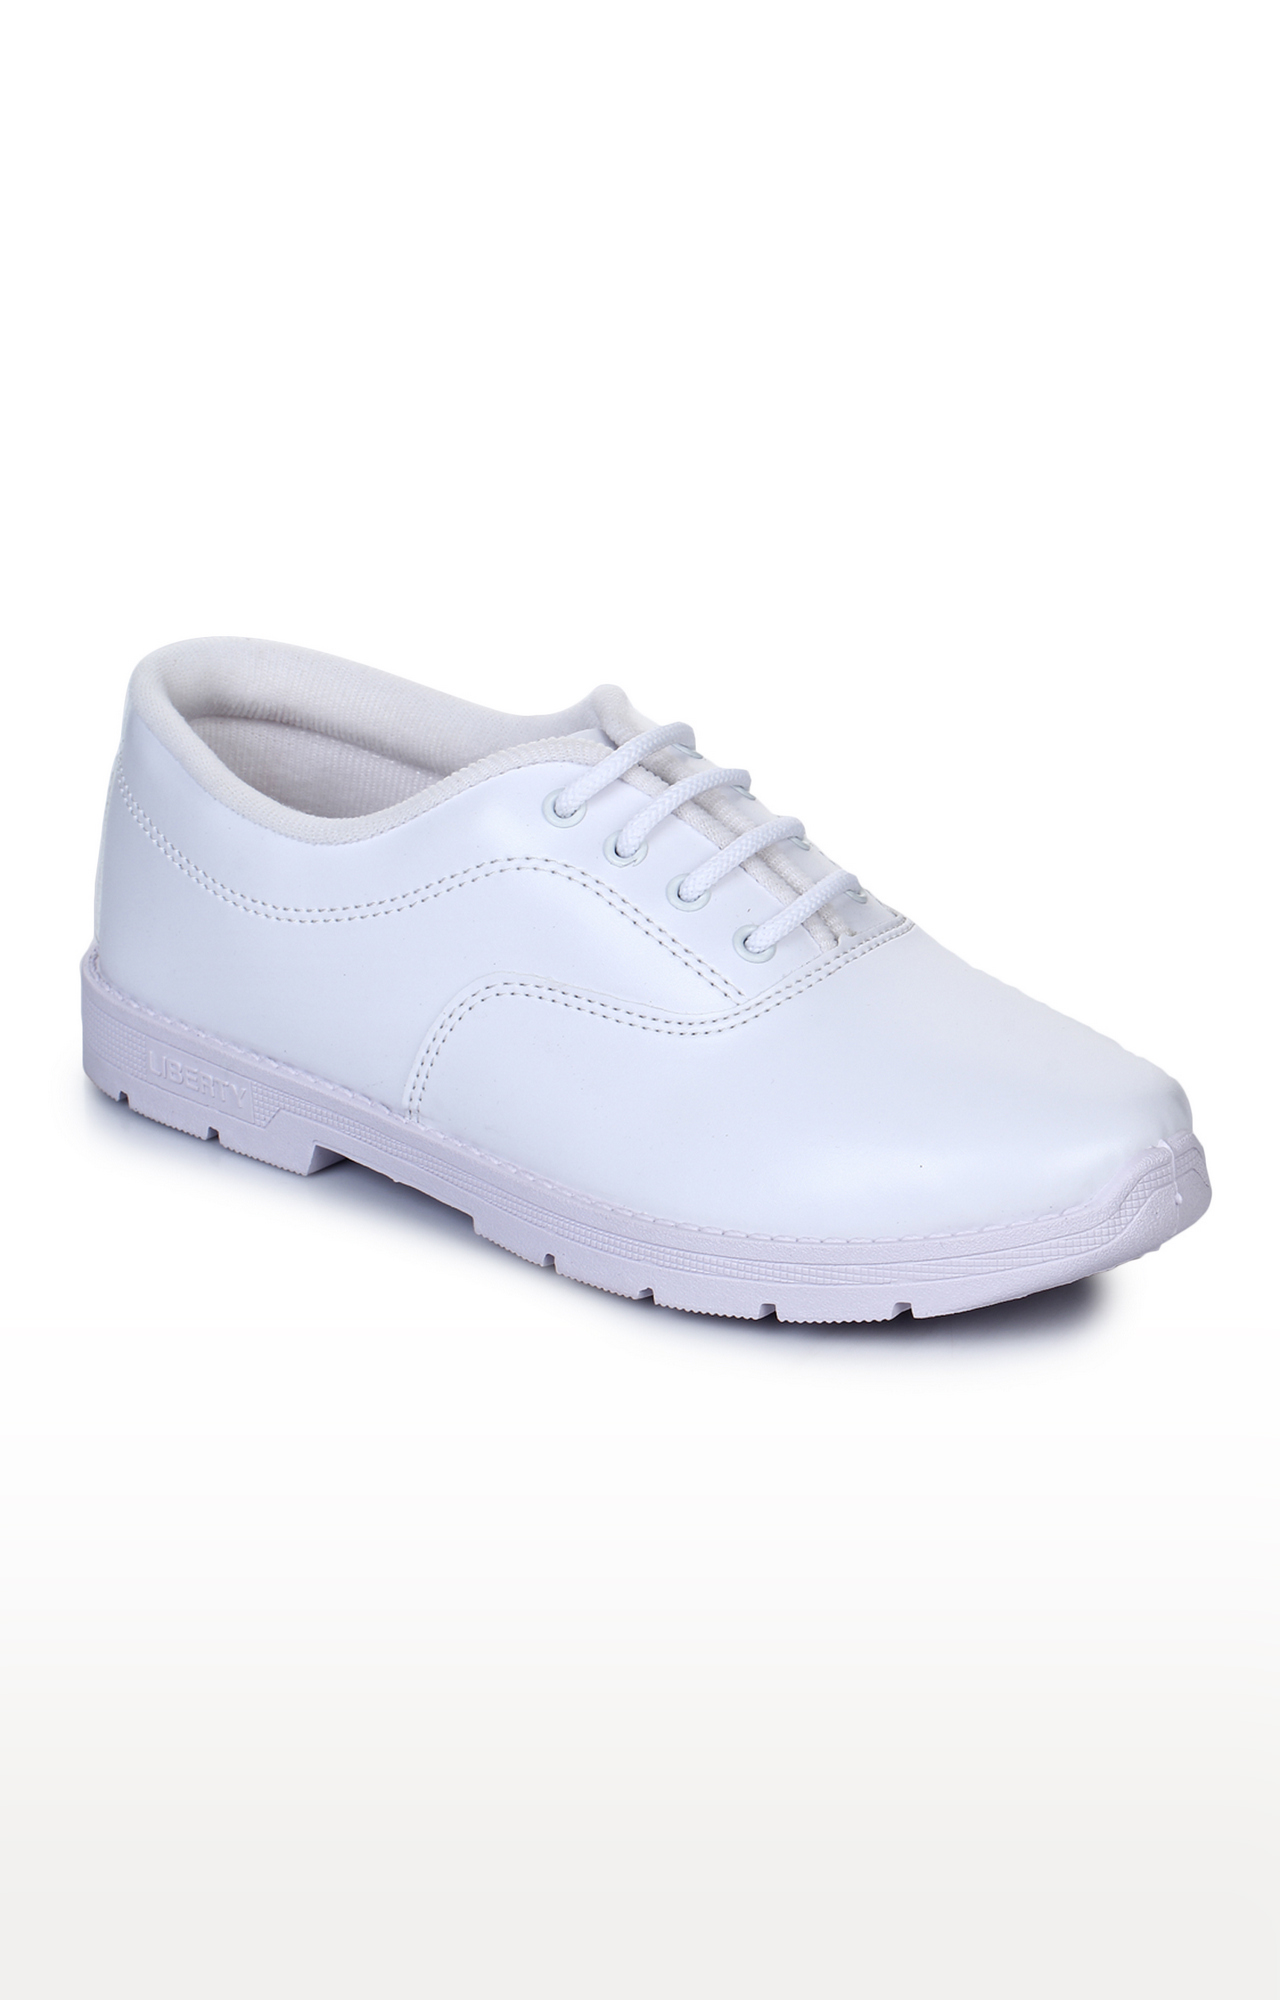 Liberty | Prefect by Liberty Unisex White School Shoes